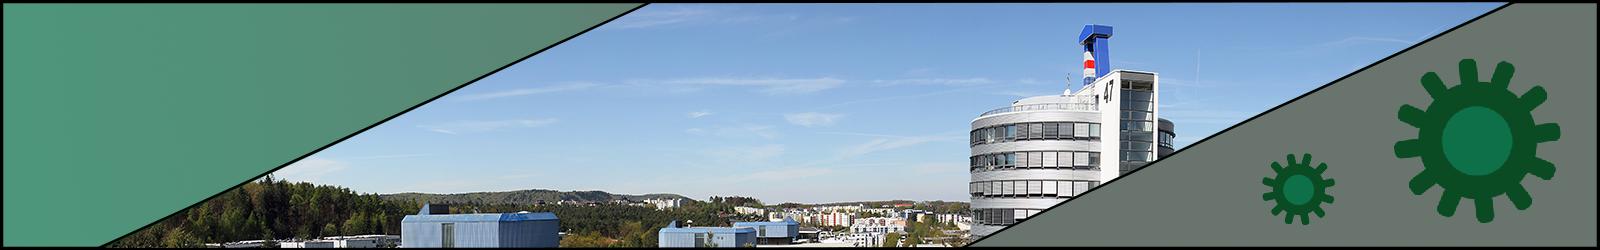 iGEM TU Kaiserslautern